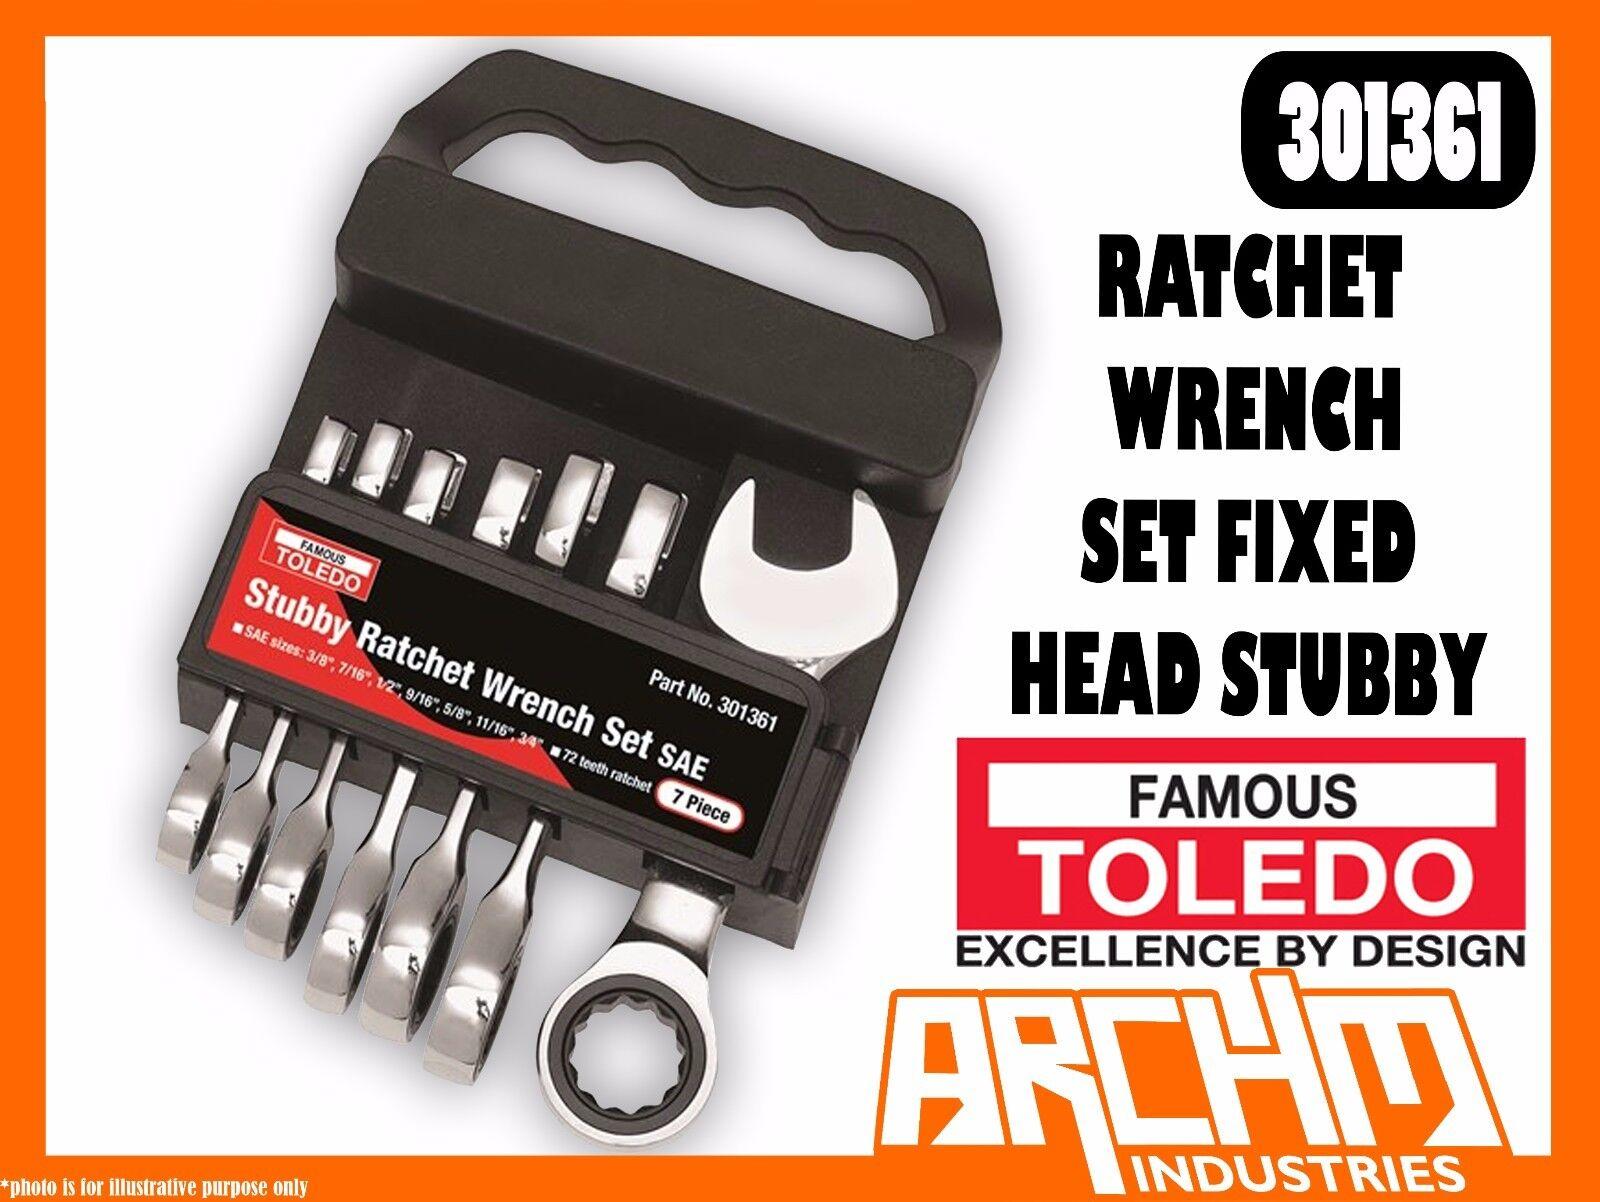 TOLEDO 301361 - RATCHET WRENCH SET FIXED HEAD STUBBY - SAE 7 PC. (3/8